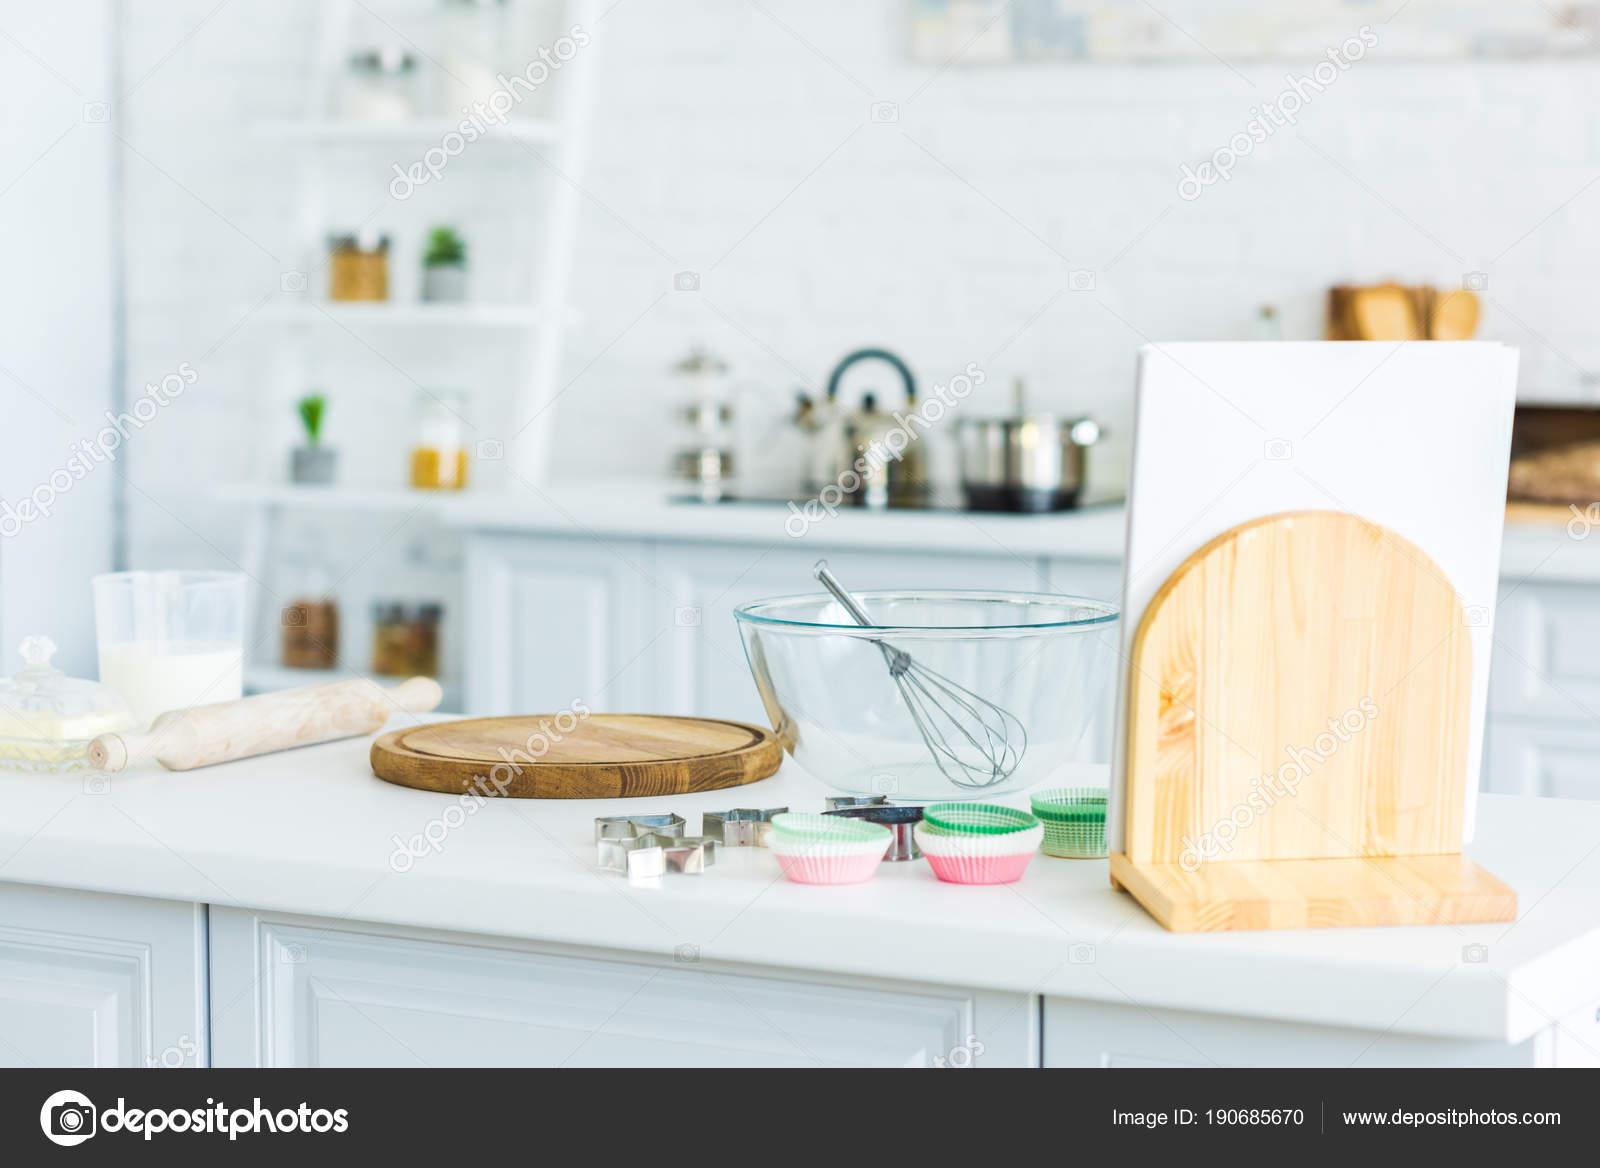 kitchen counter mid century chairs 厨房柜台带扫的切板和碗 图库照片 c igorvetushko 190685670